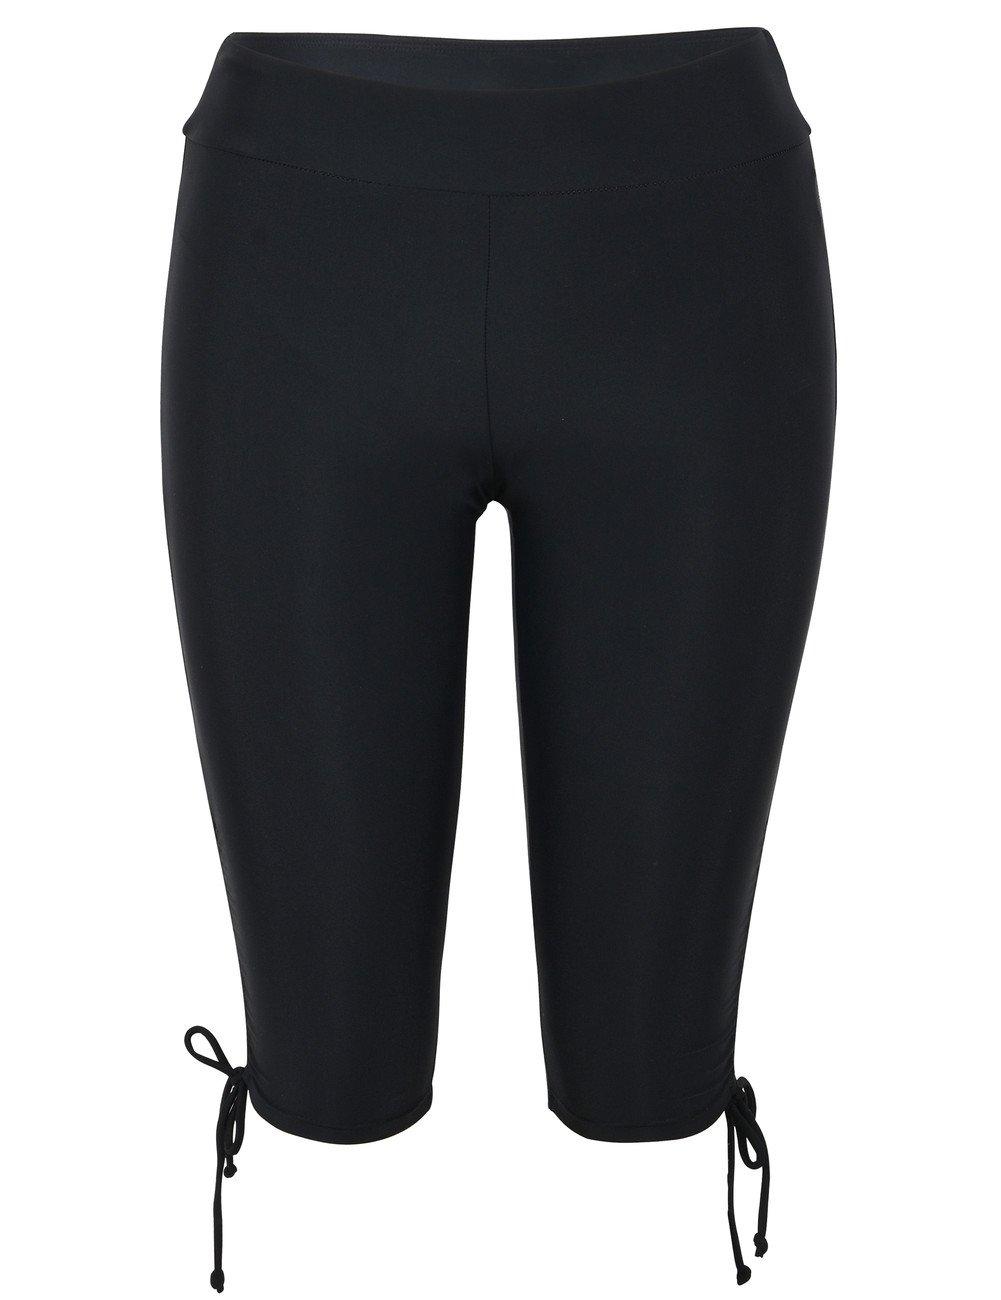 Firpearl Women's Swim Shorts Drawstring UPF50+ Swim Capris Board Shorts Swimsuit Bottom US24 Black